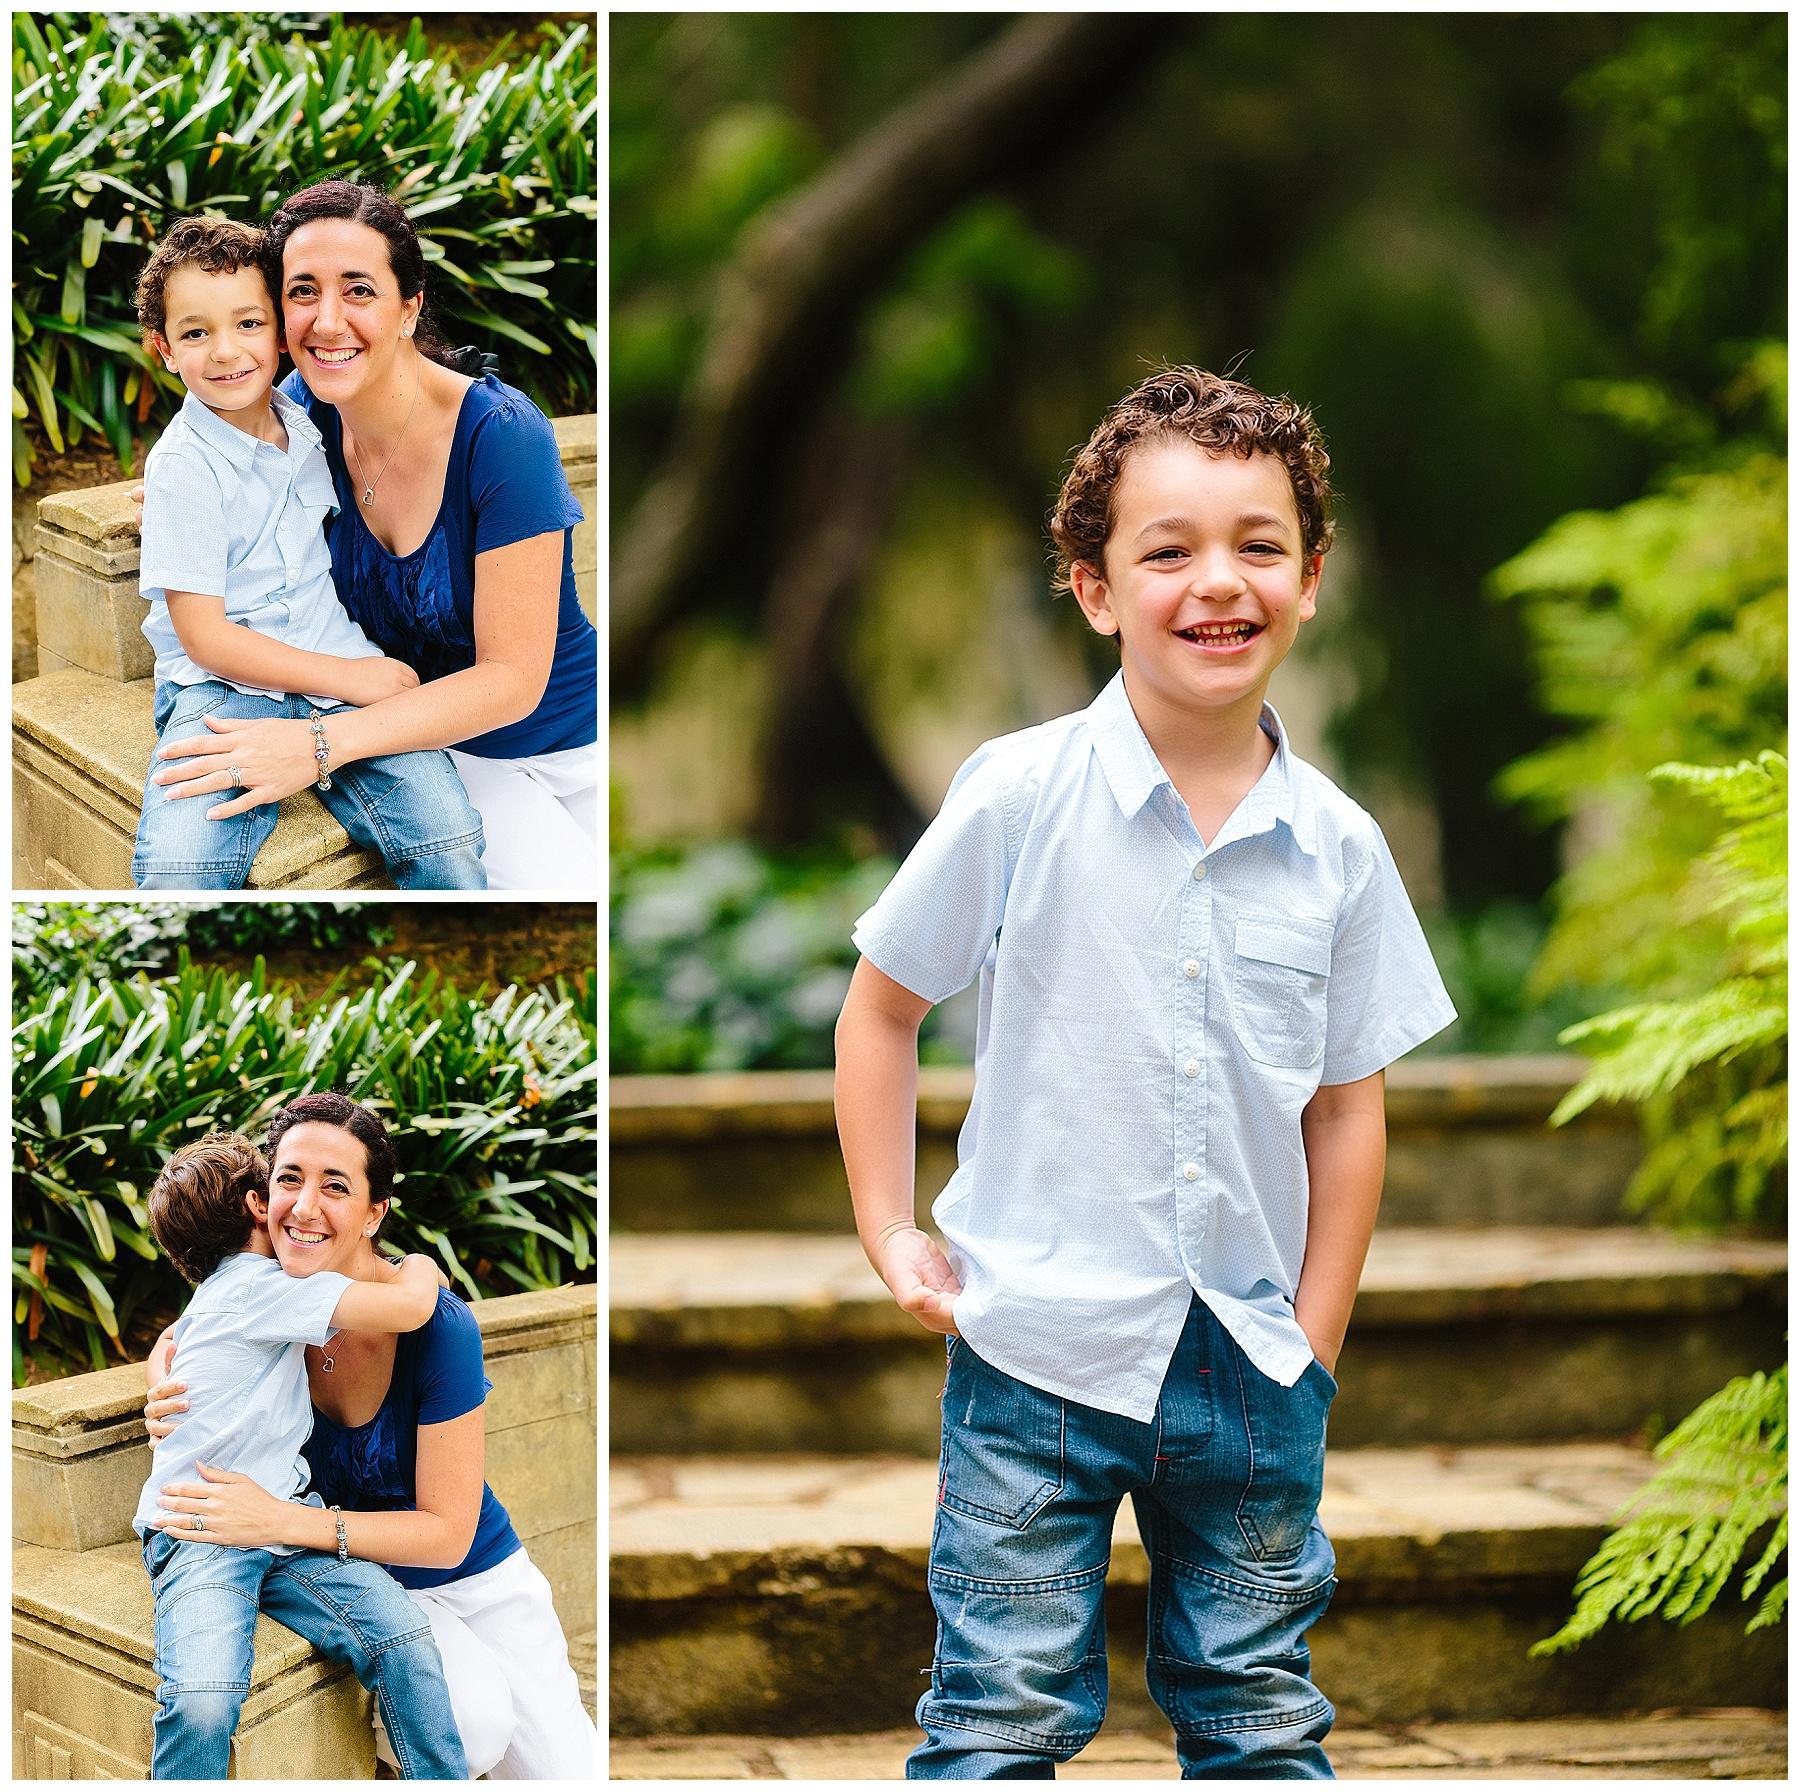 kids photographer Perth